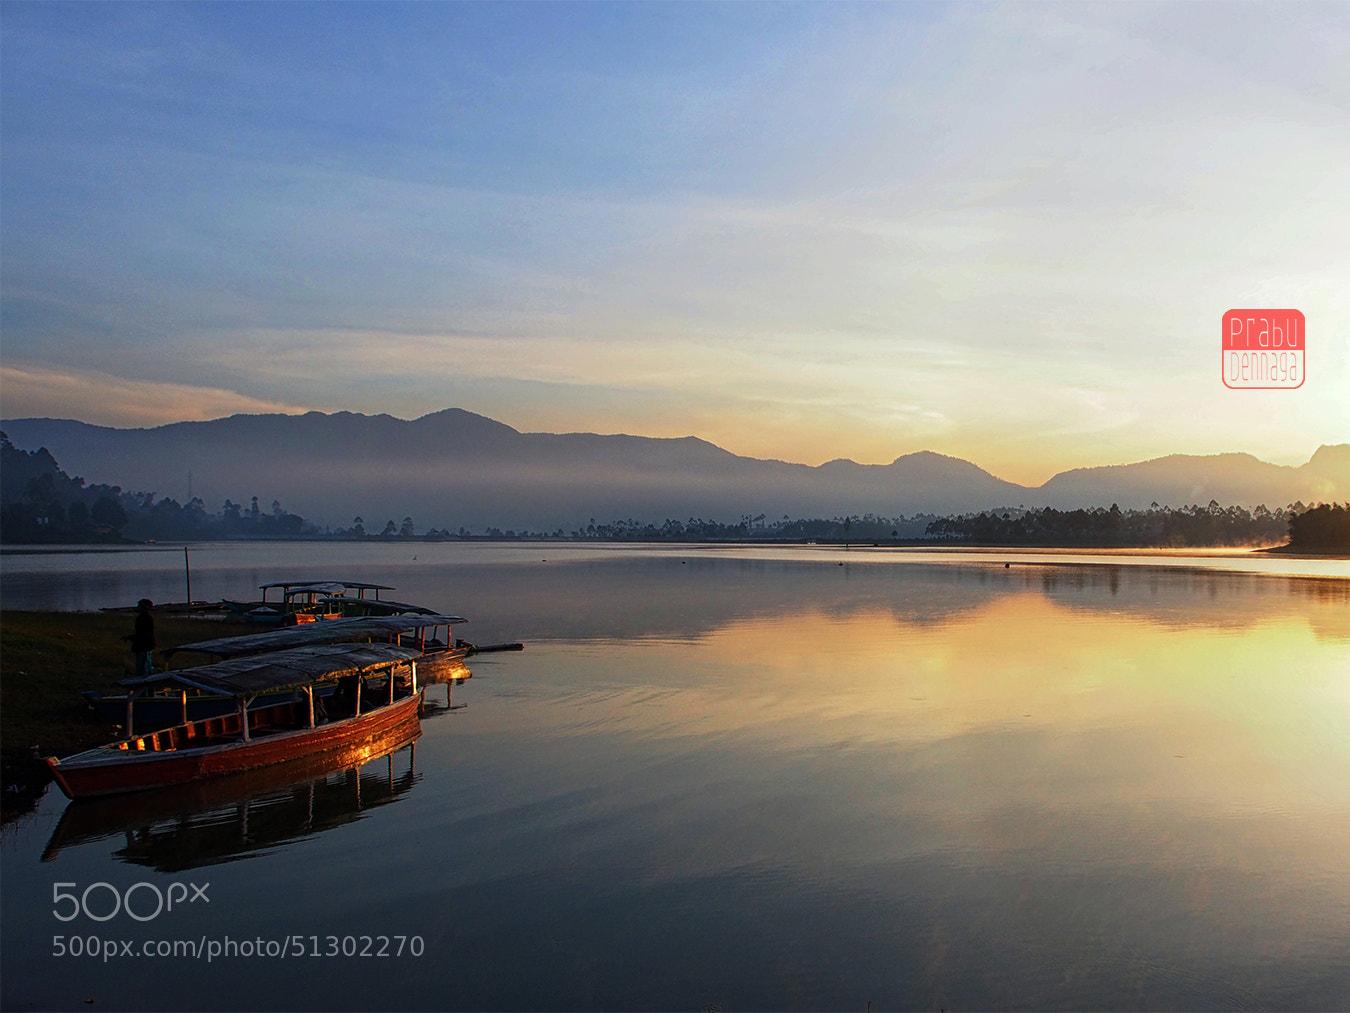 Photograph Morning story by Prabu dennaga on 500px